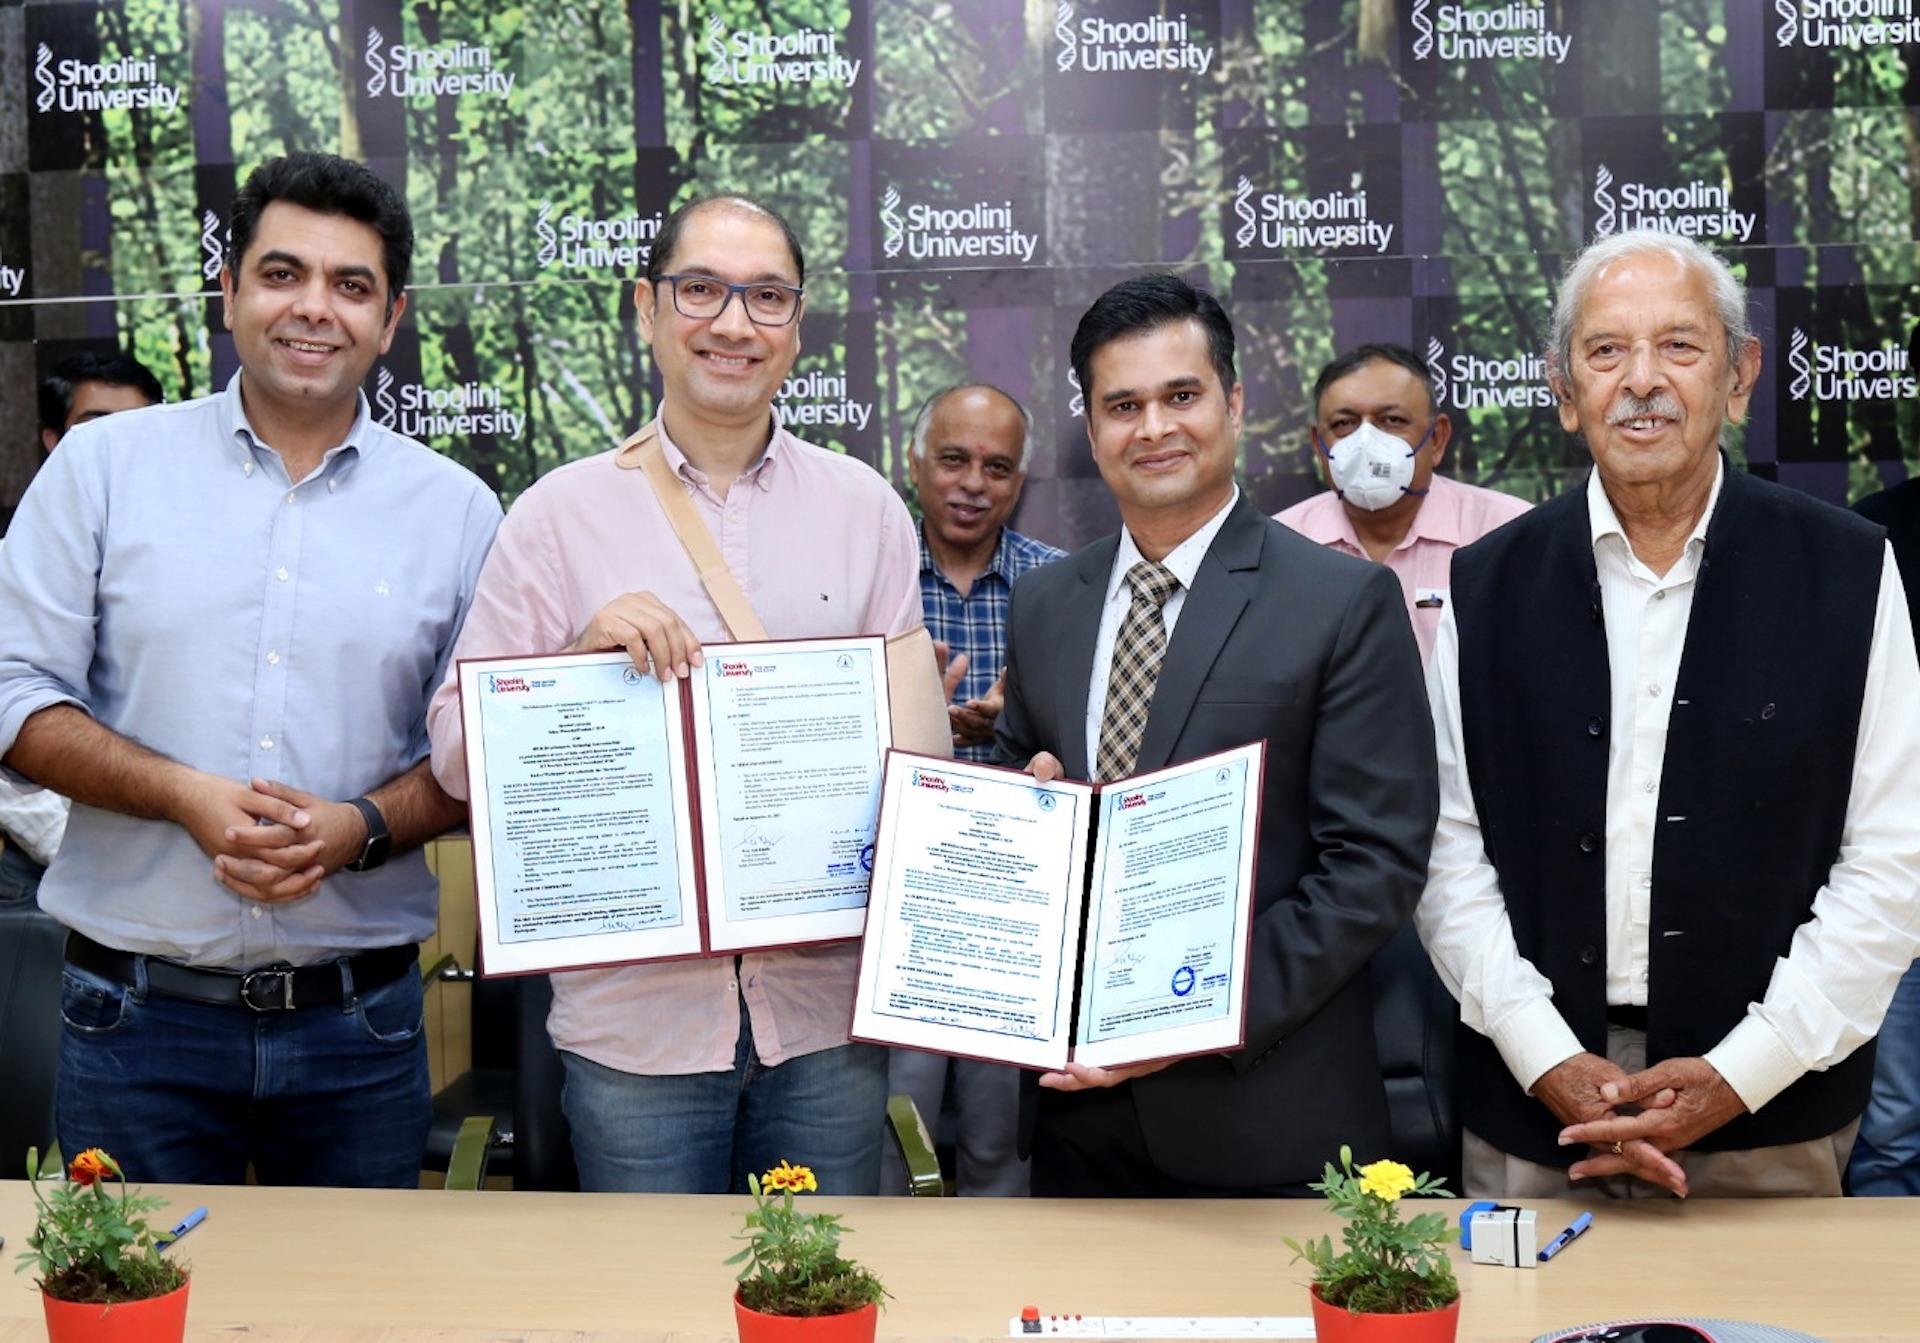 Shoolini signs prestigious MoU with centrally sponsored IT hub